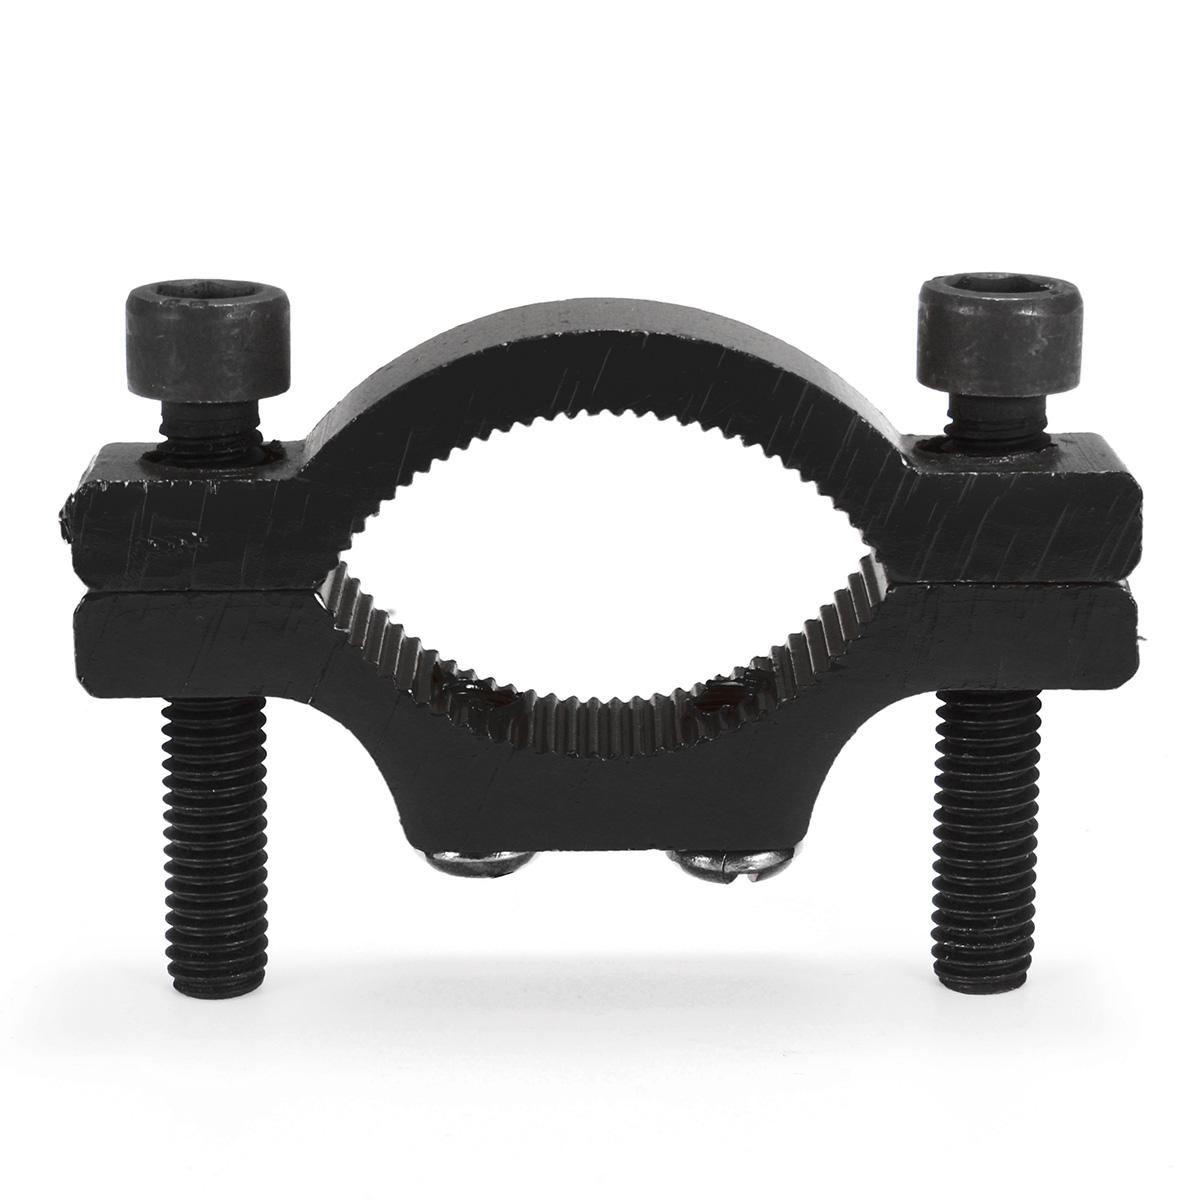 Headlight Spot Lightt Mount Fixed Clamp Bracket Clip Motorcycle E-bike Aluminum